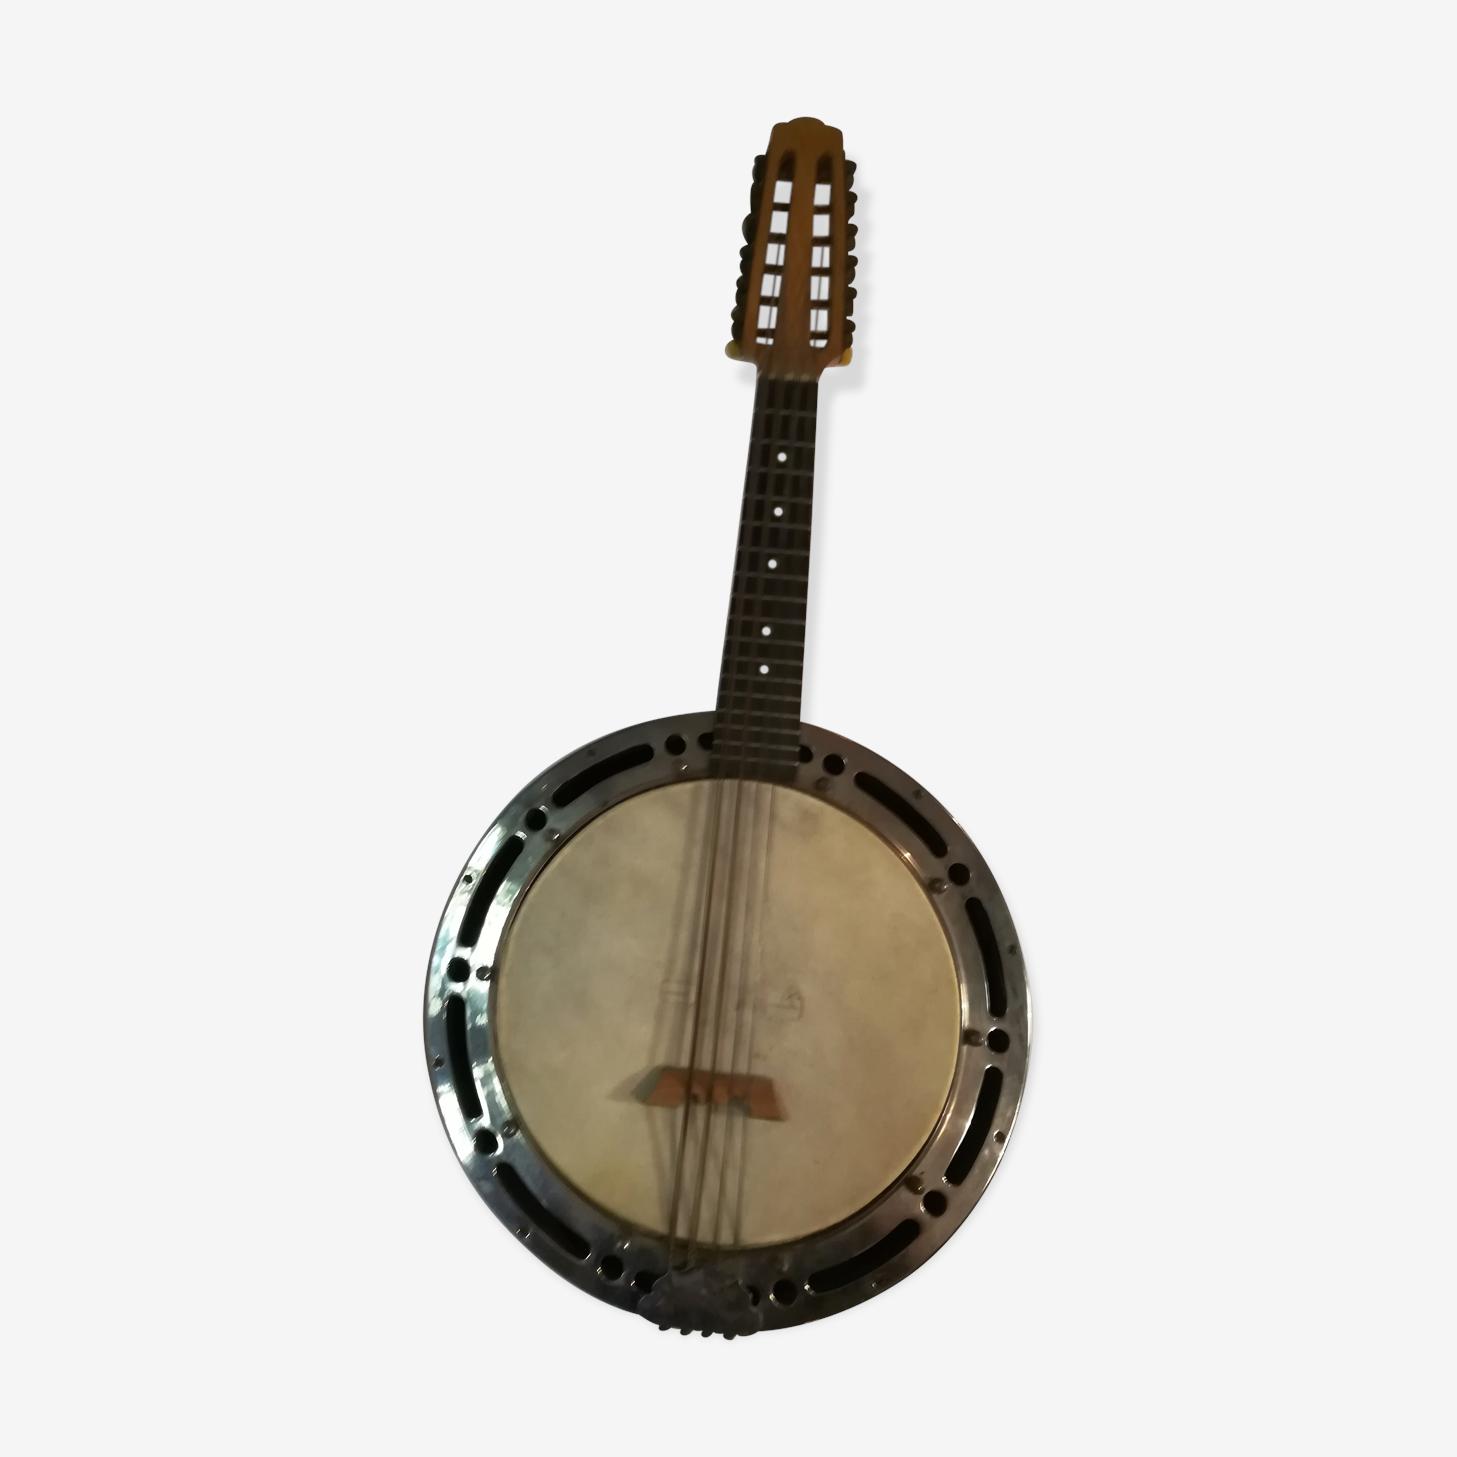 Banjo Vercruysse et Dhondt de Lille